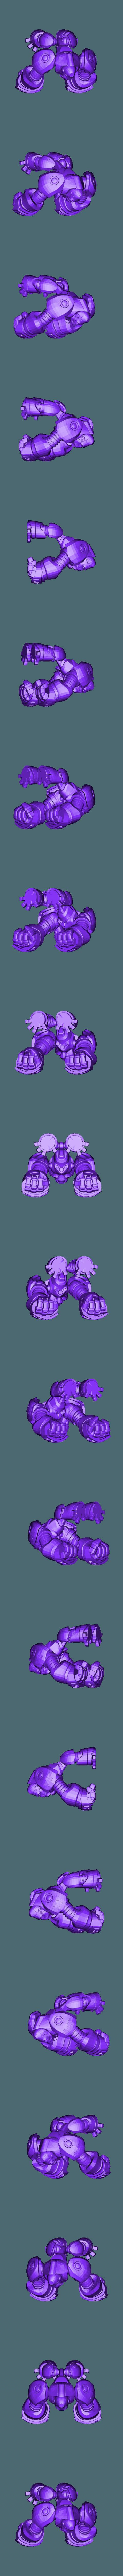 gorilla_tron_full_lowpoly.stl Download free STL file G - TRON • 3D printable model, TheTNR